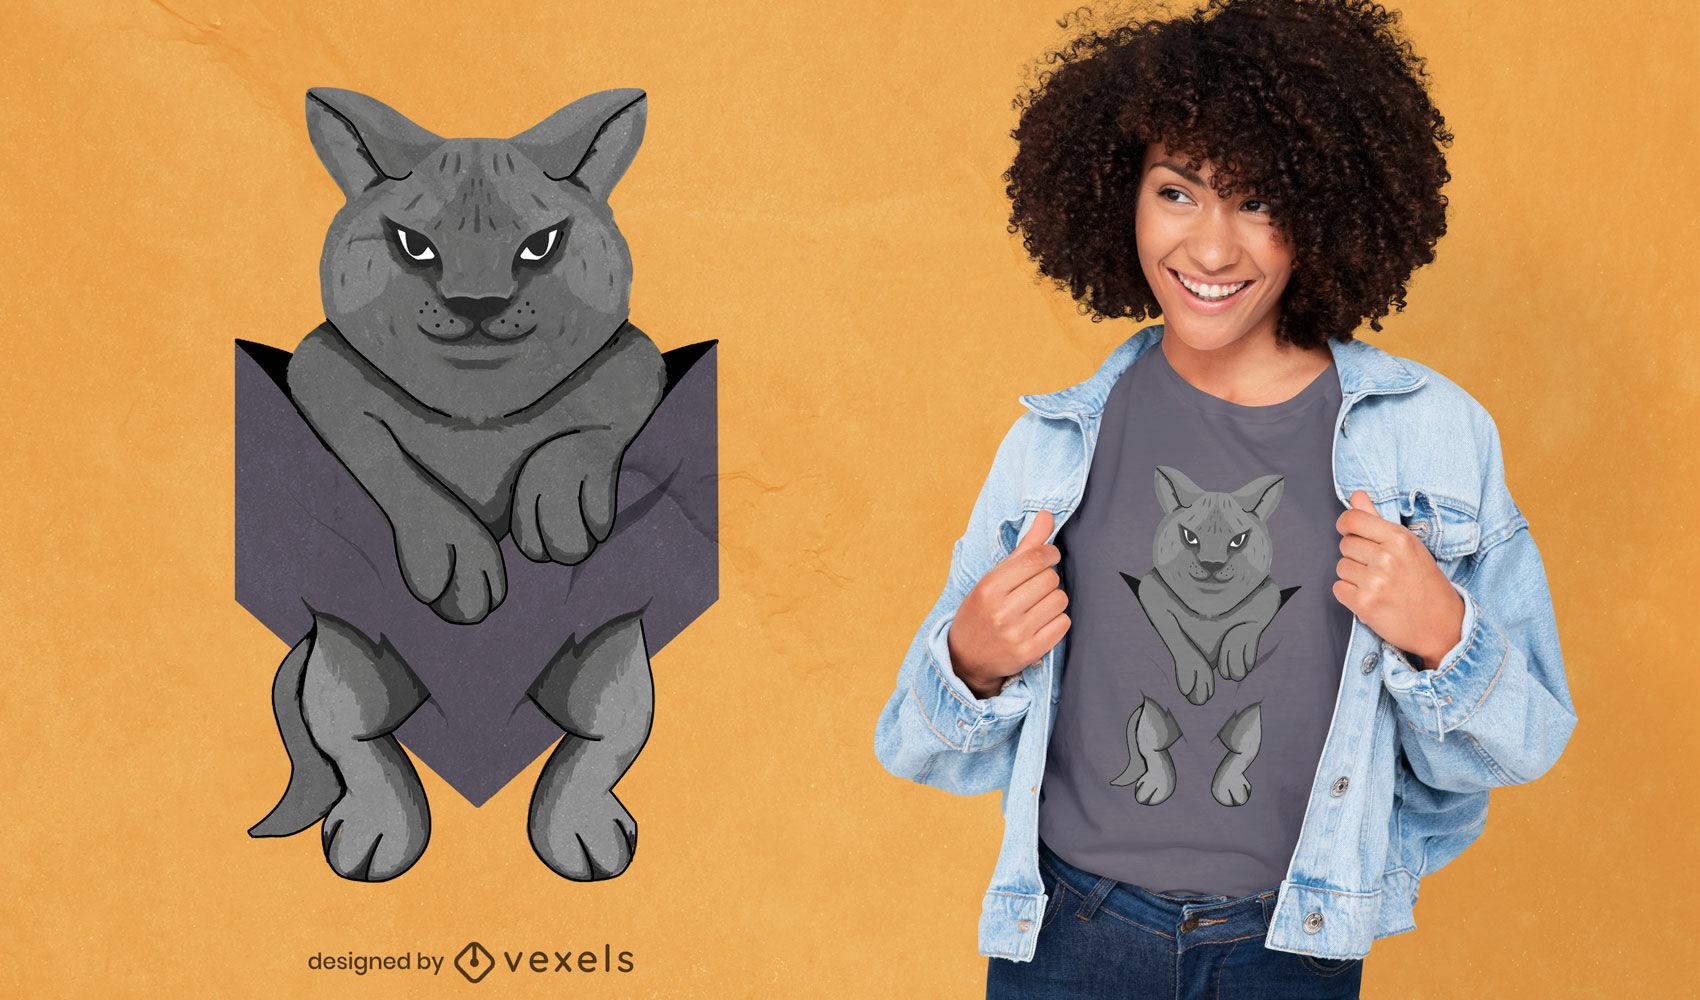 Black cat animal in pocket t-shirt design